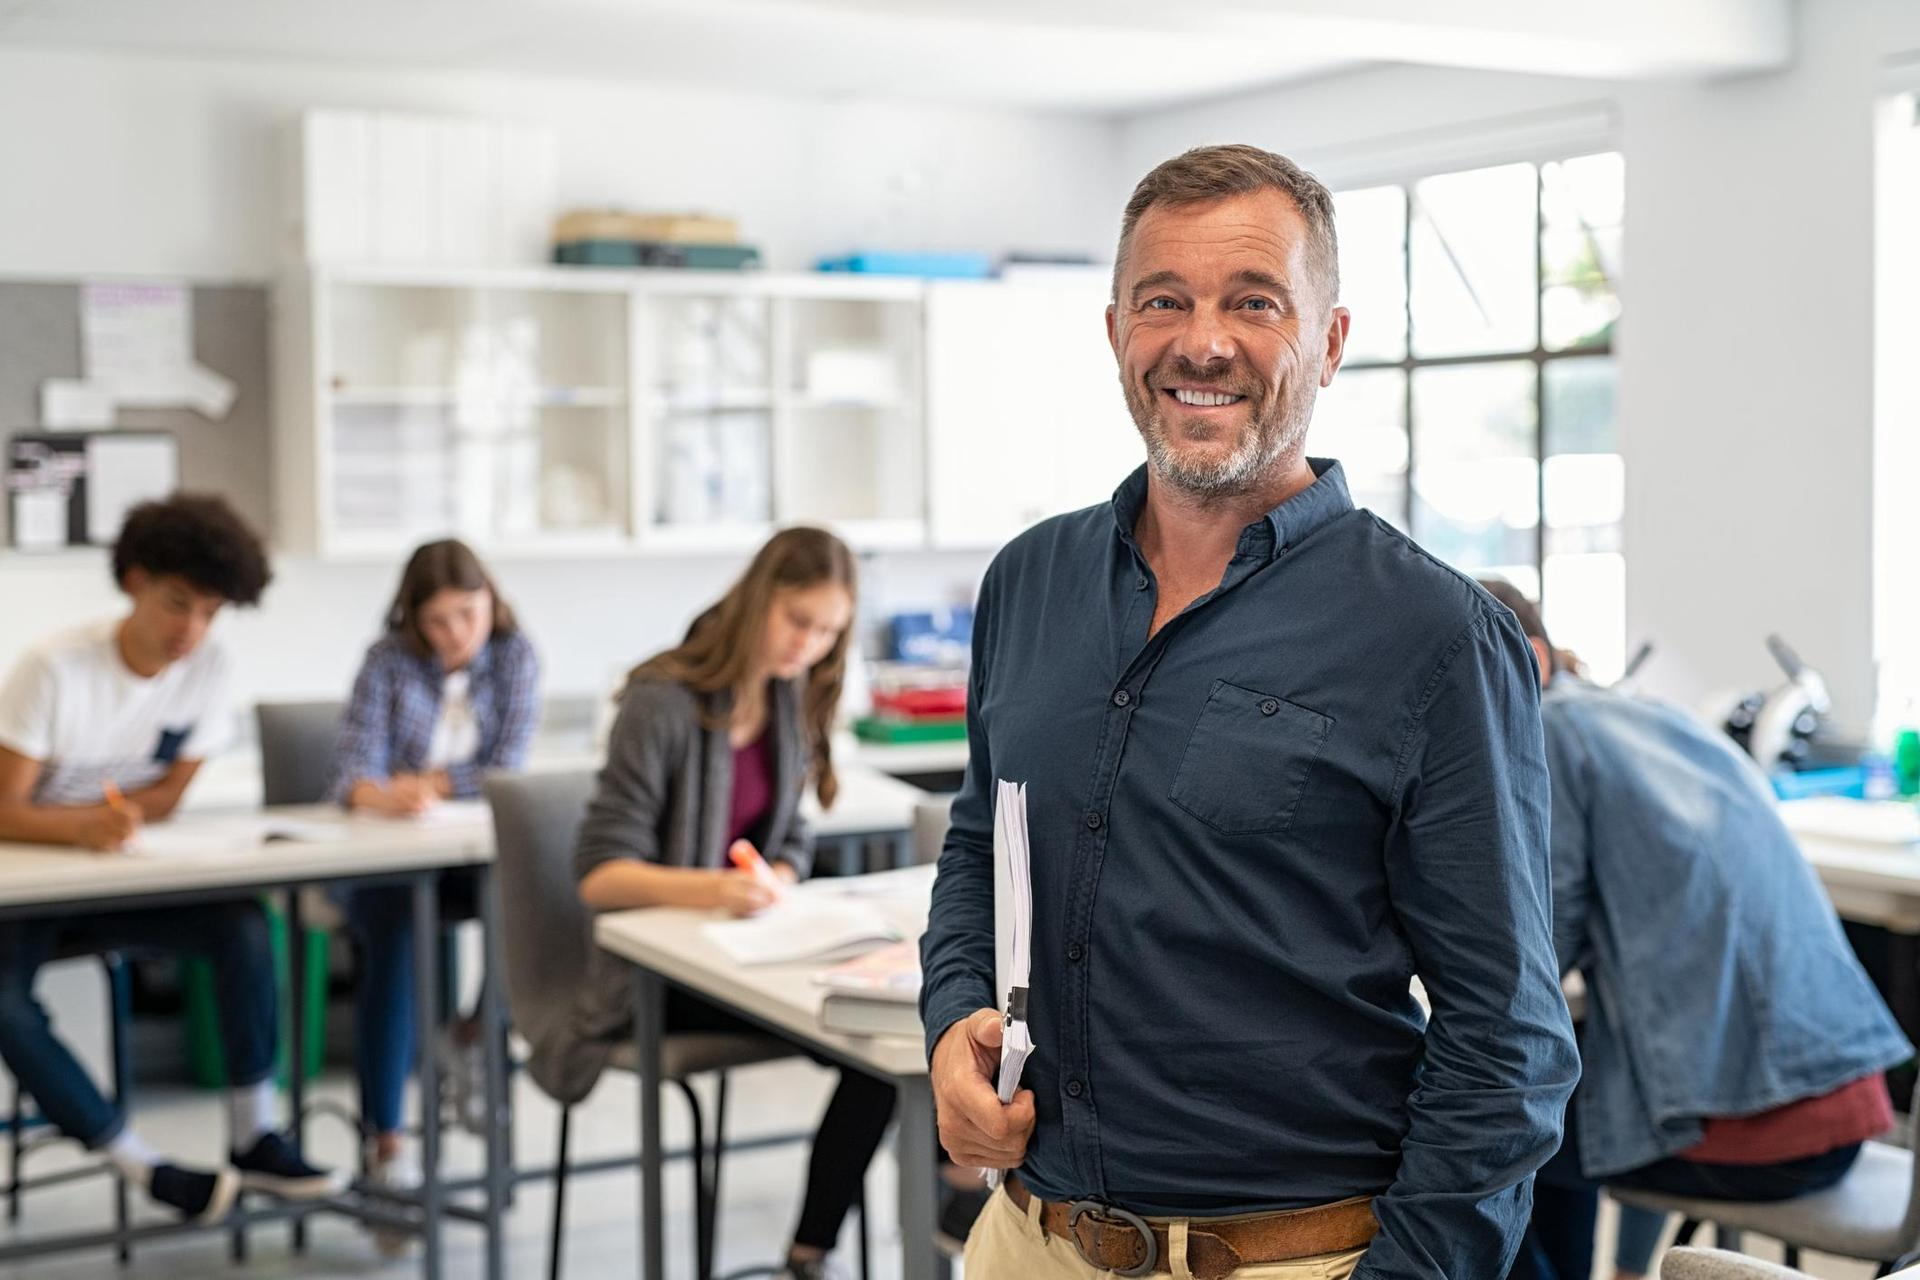 Male high school teacher looking at camera